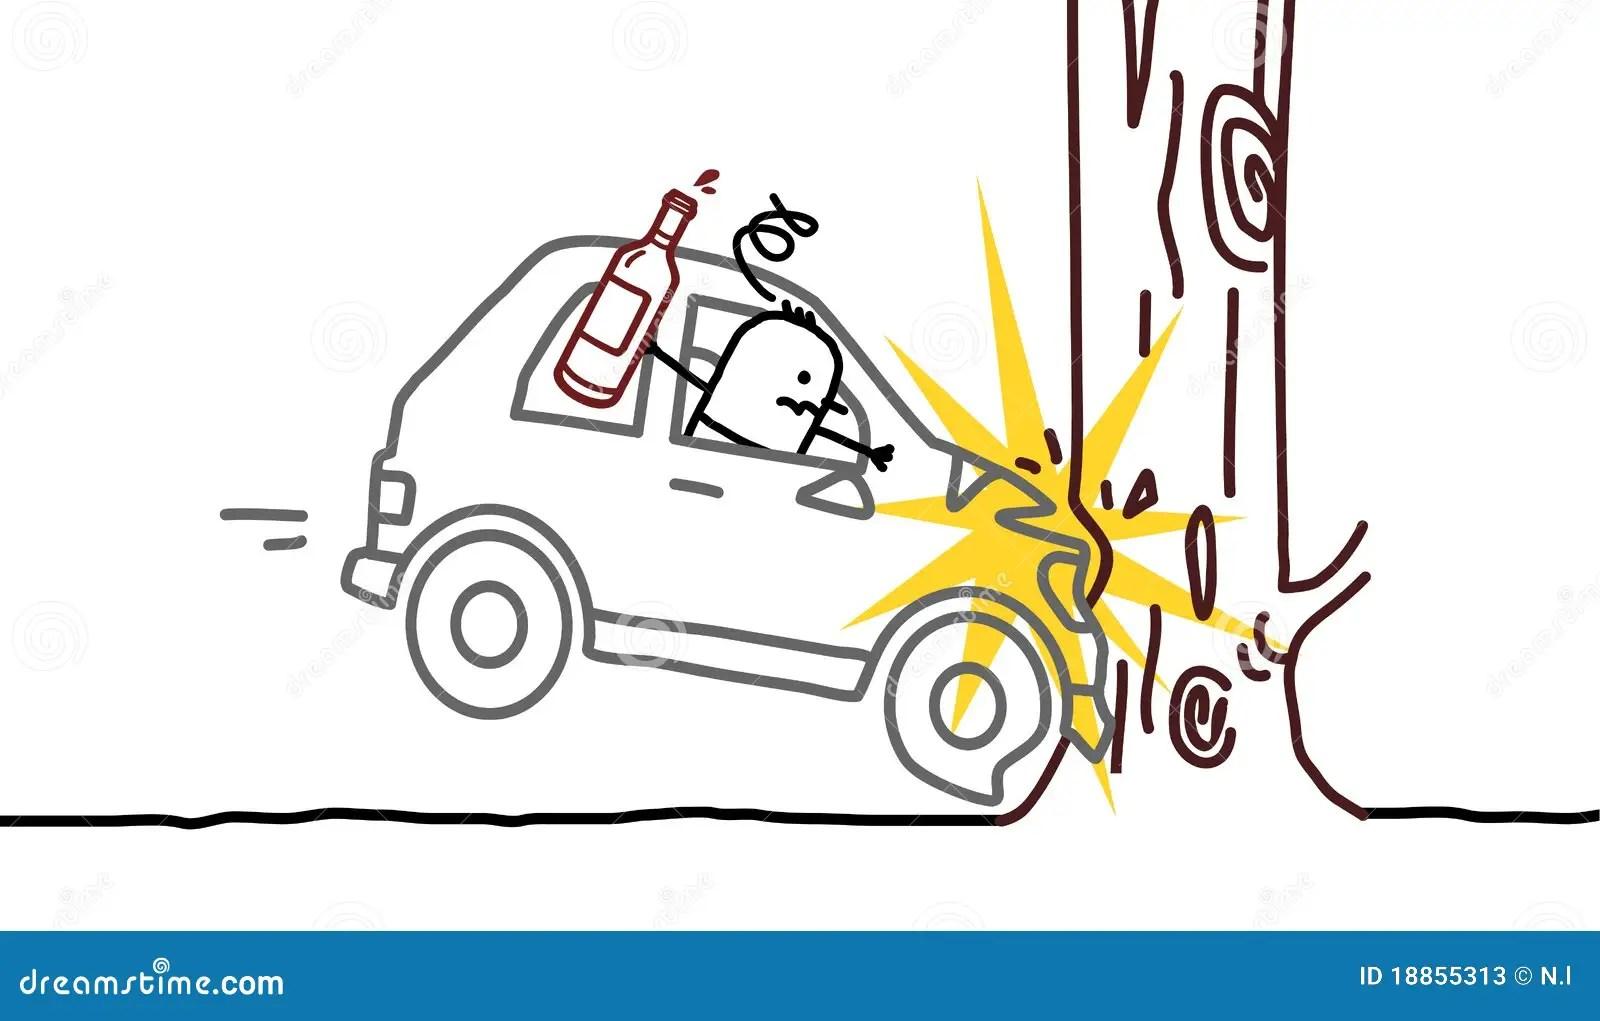 Easy To Draw A Car Crash